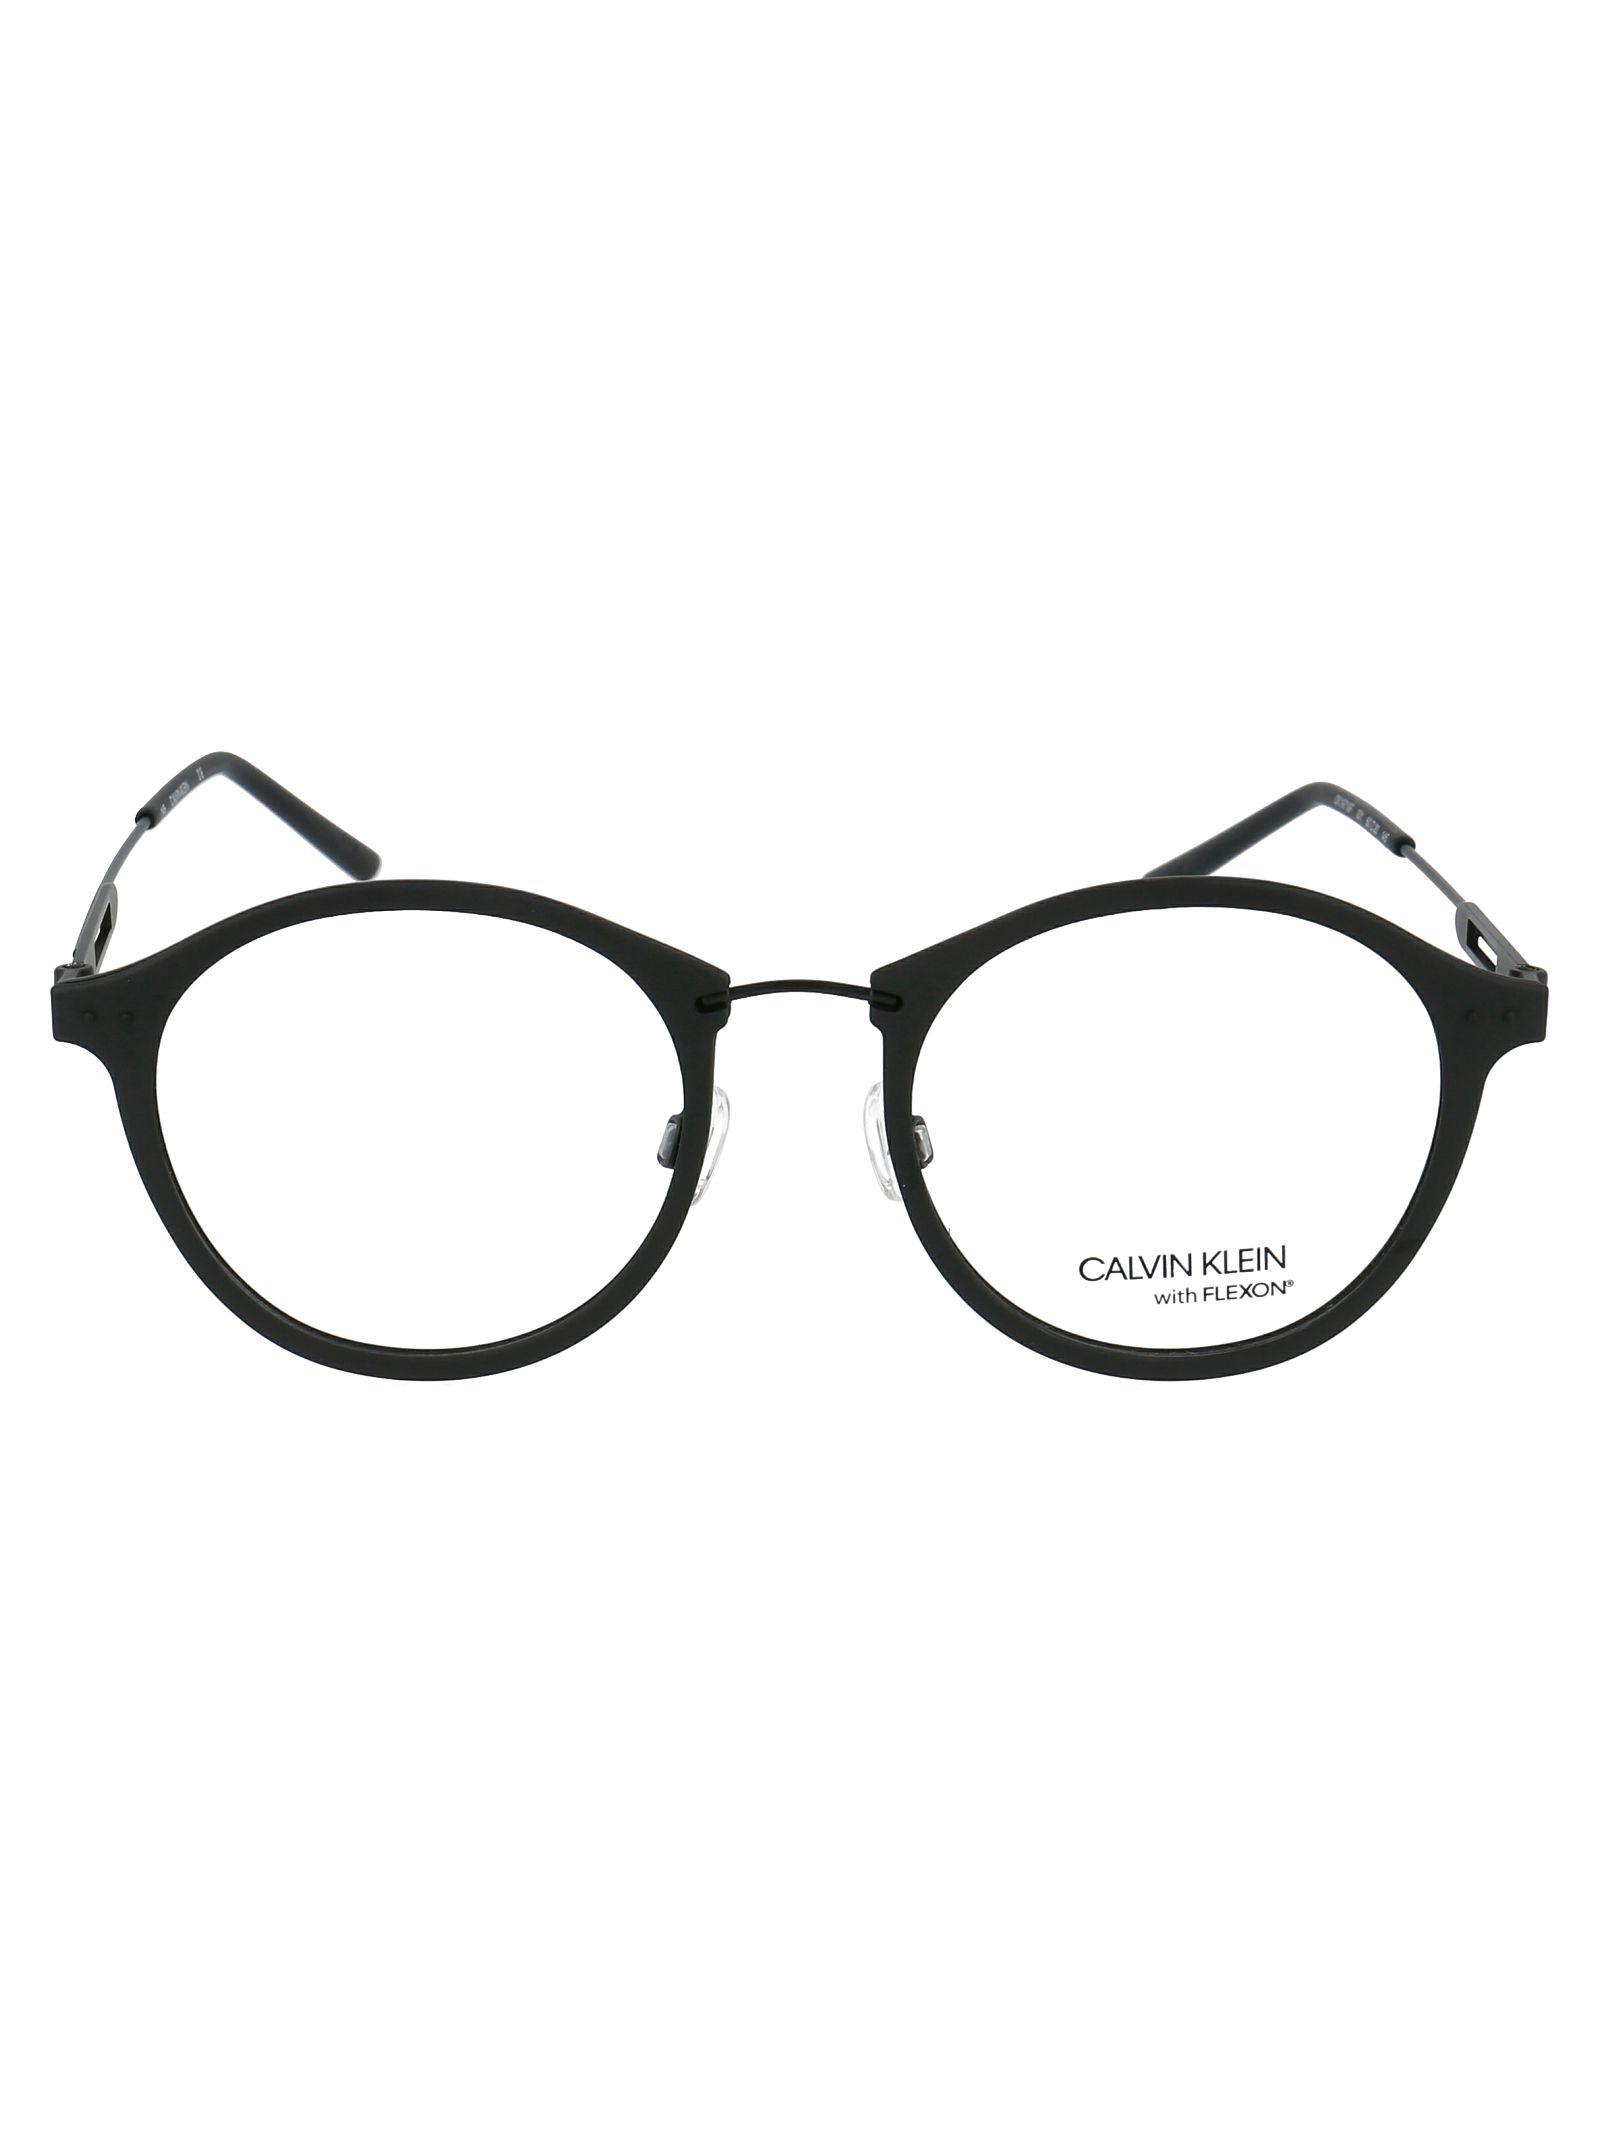 Calvin Klein Black Metal Glasses